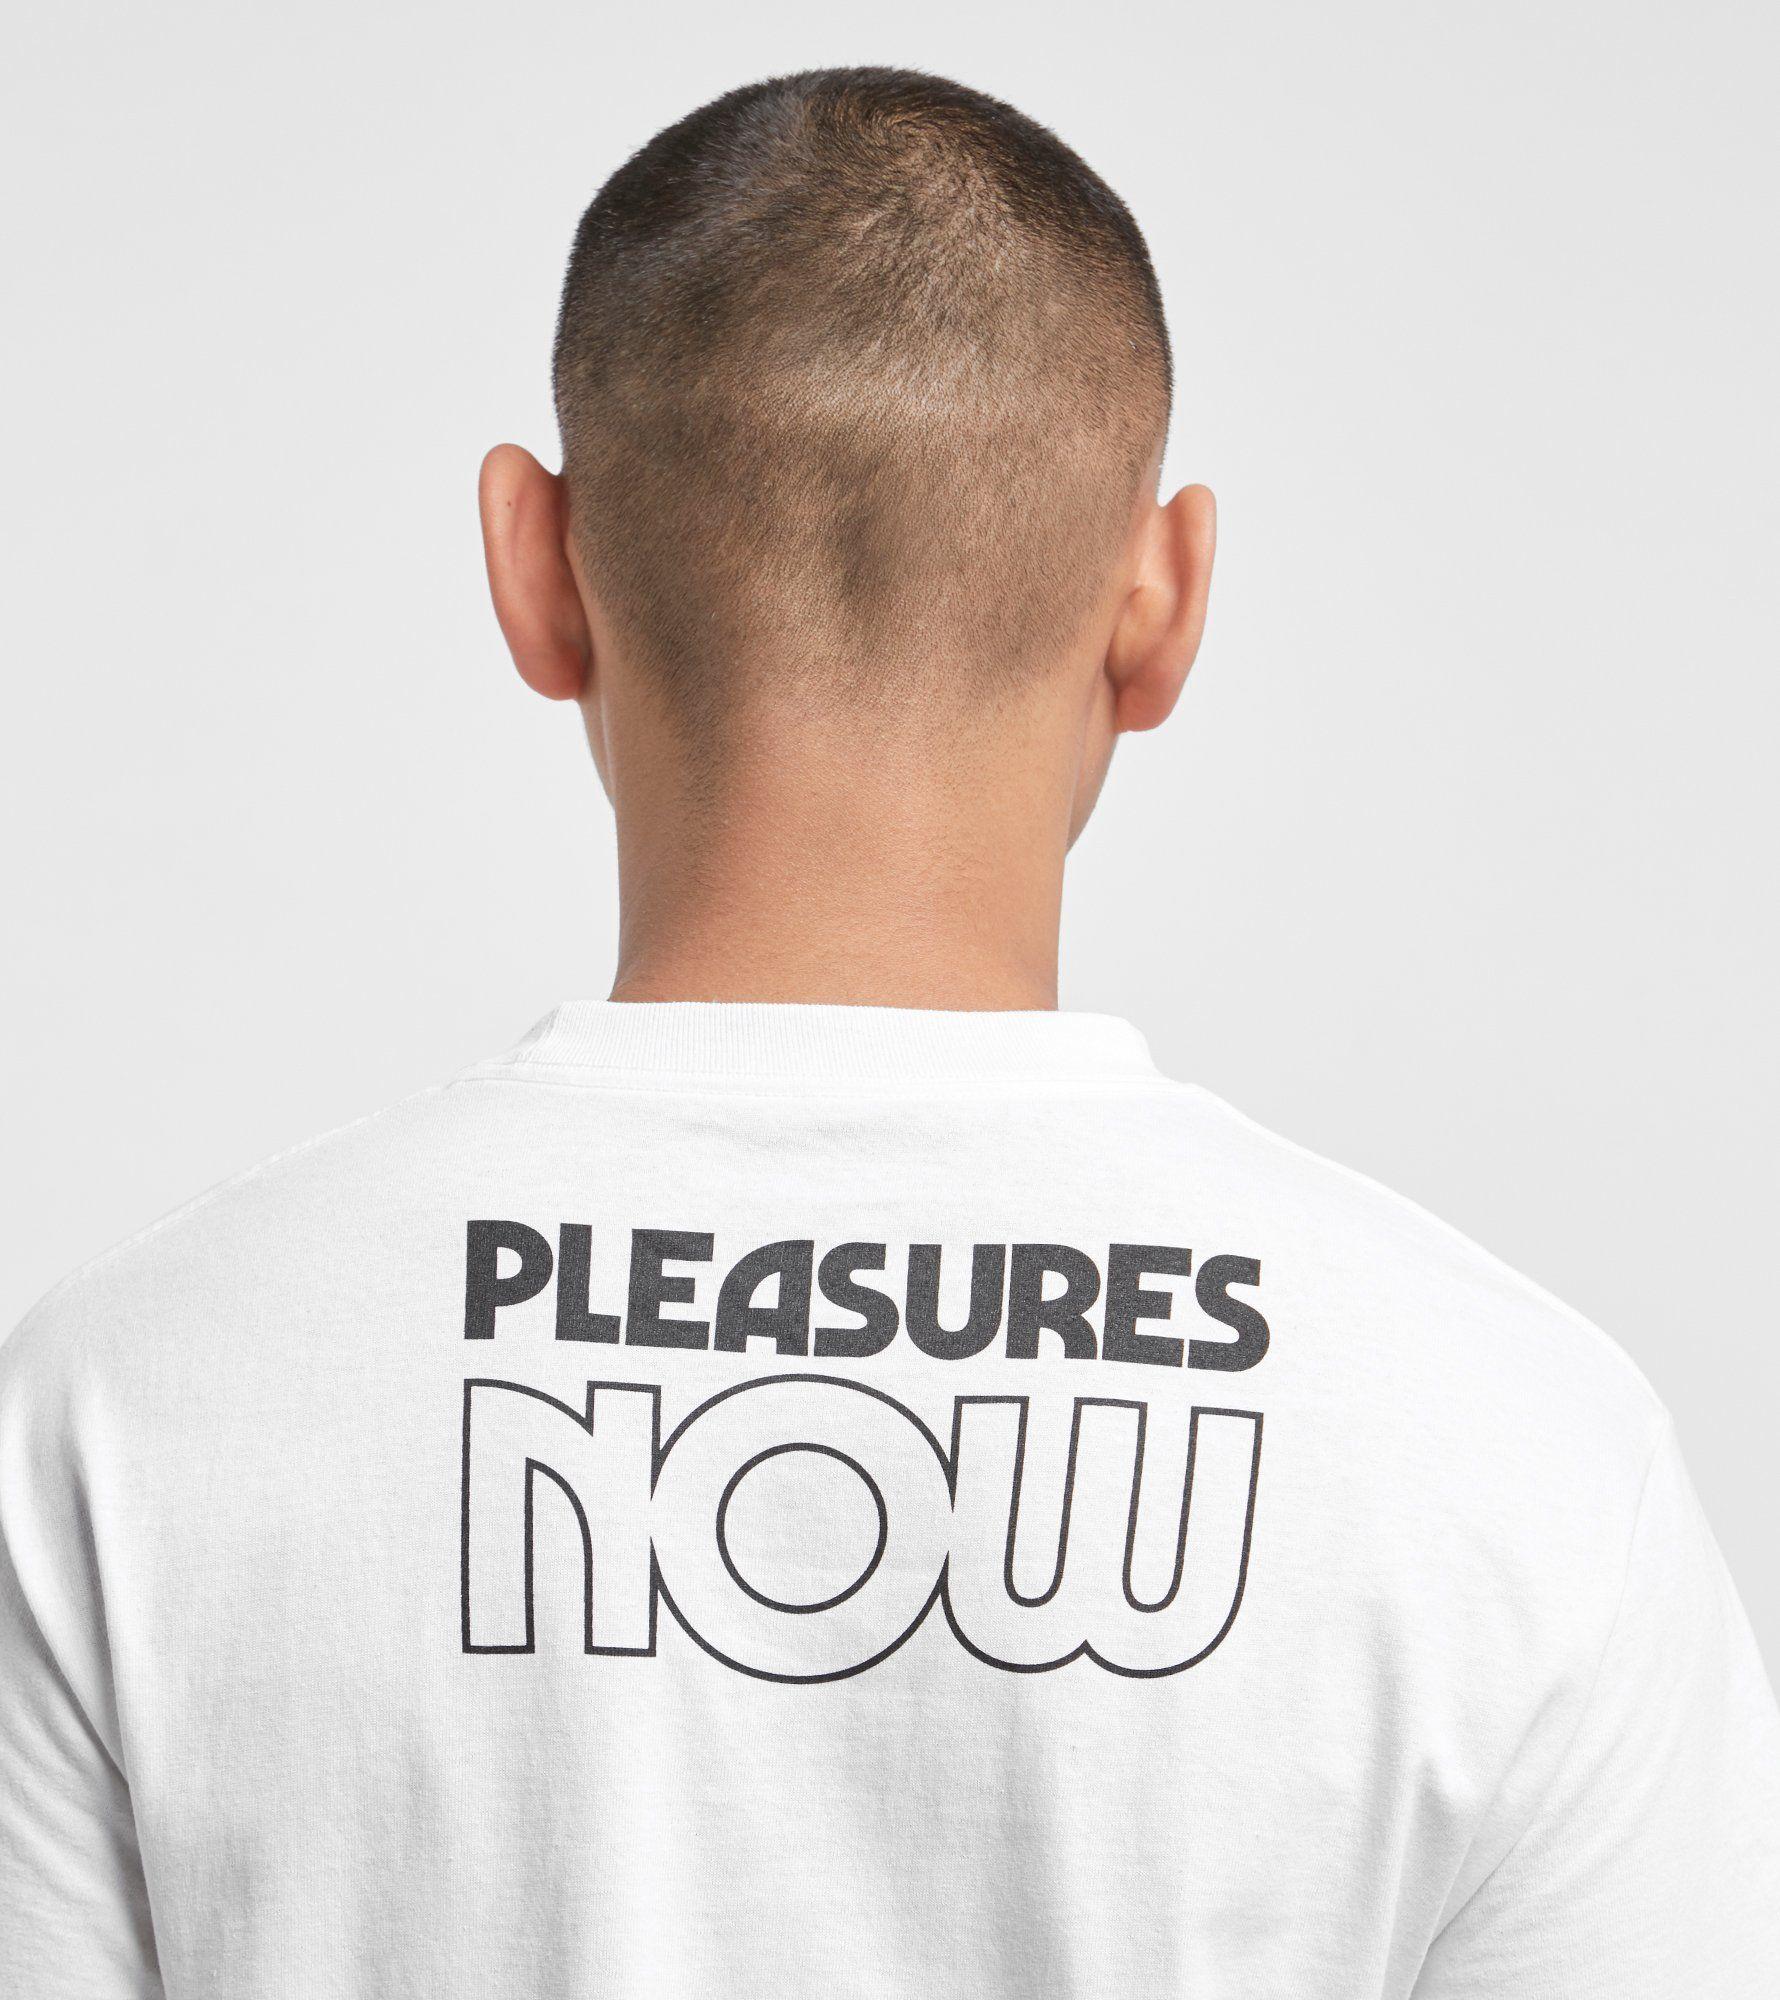 PLEASURES Germ Free T-shirt